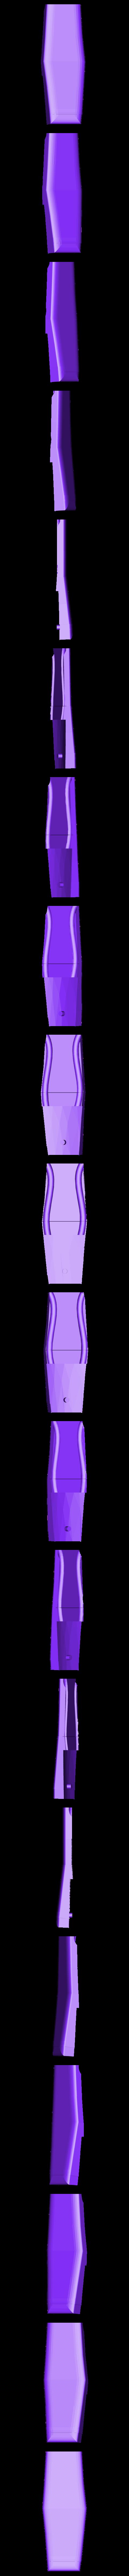 zadel.stl Download free STL file quad (custom) • 3D printing design, jasperbaudoin